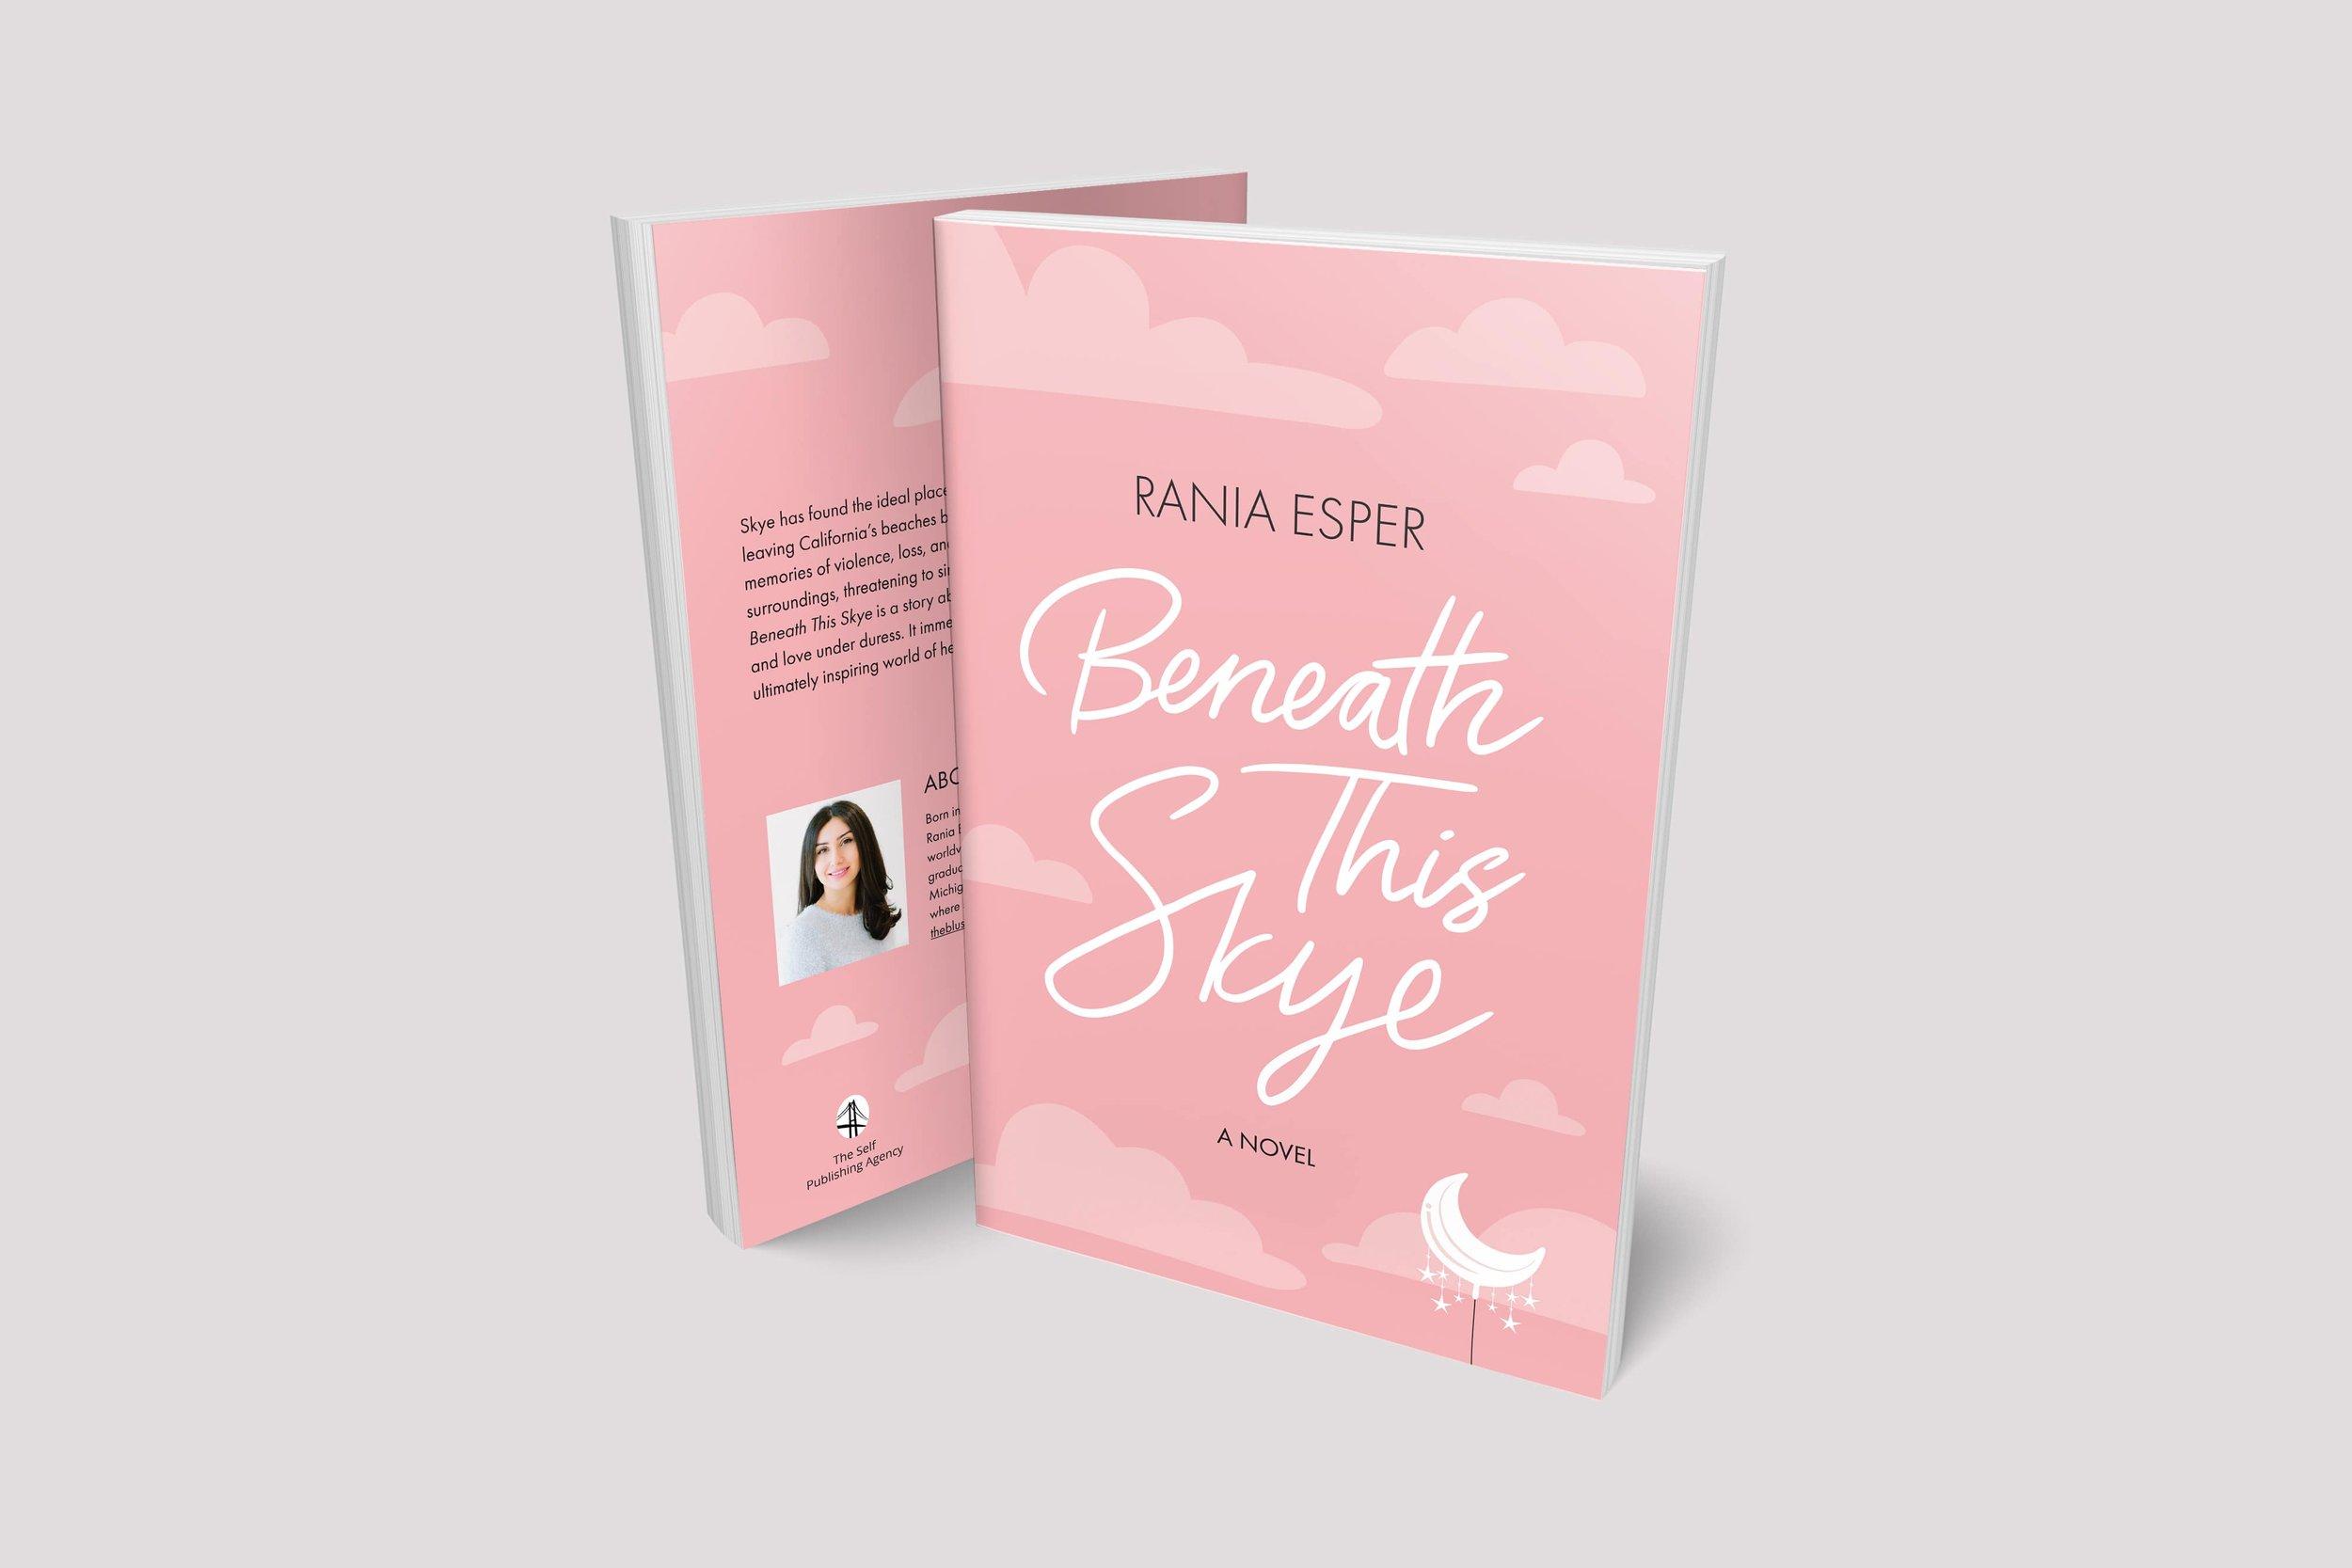 Rania-Esper-Beneath-This-Skye-Interior2.jpg